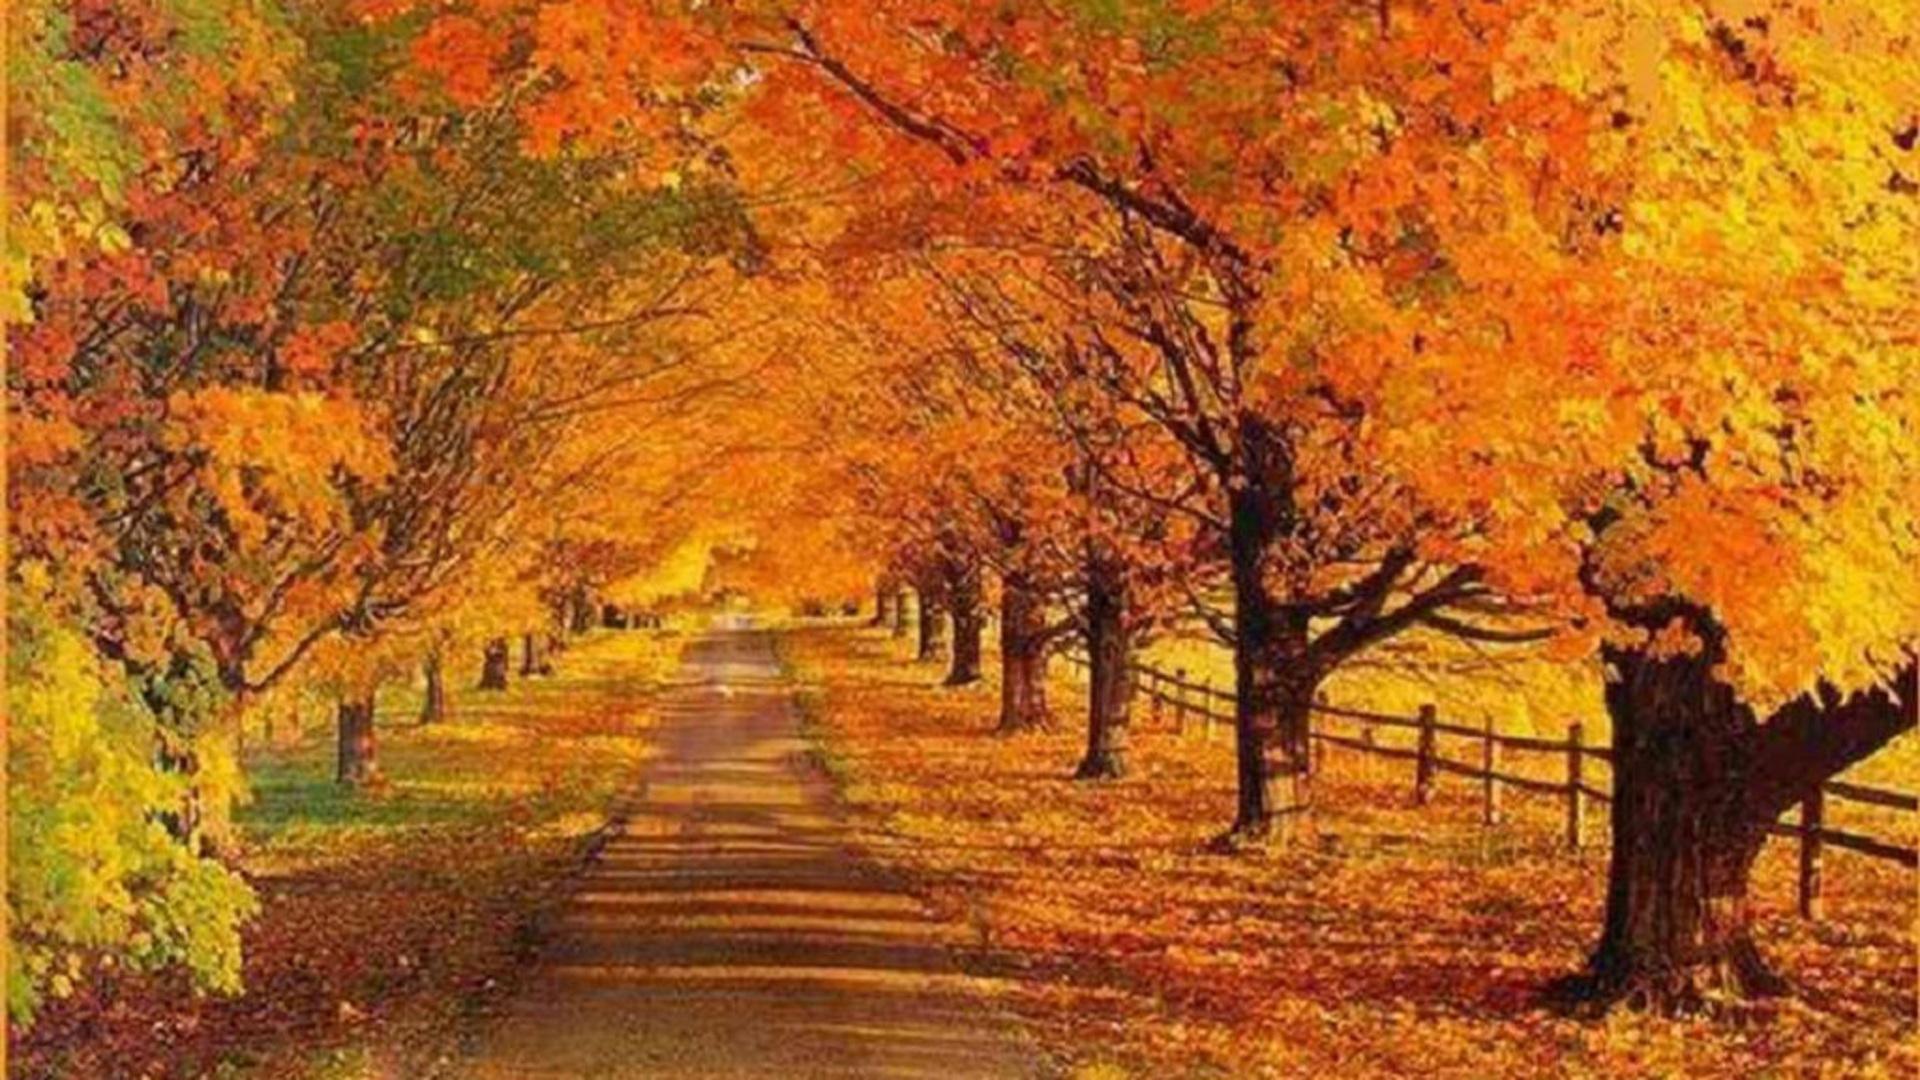 wallpaper other landscape autumn road